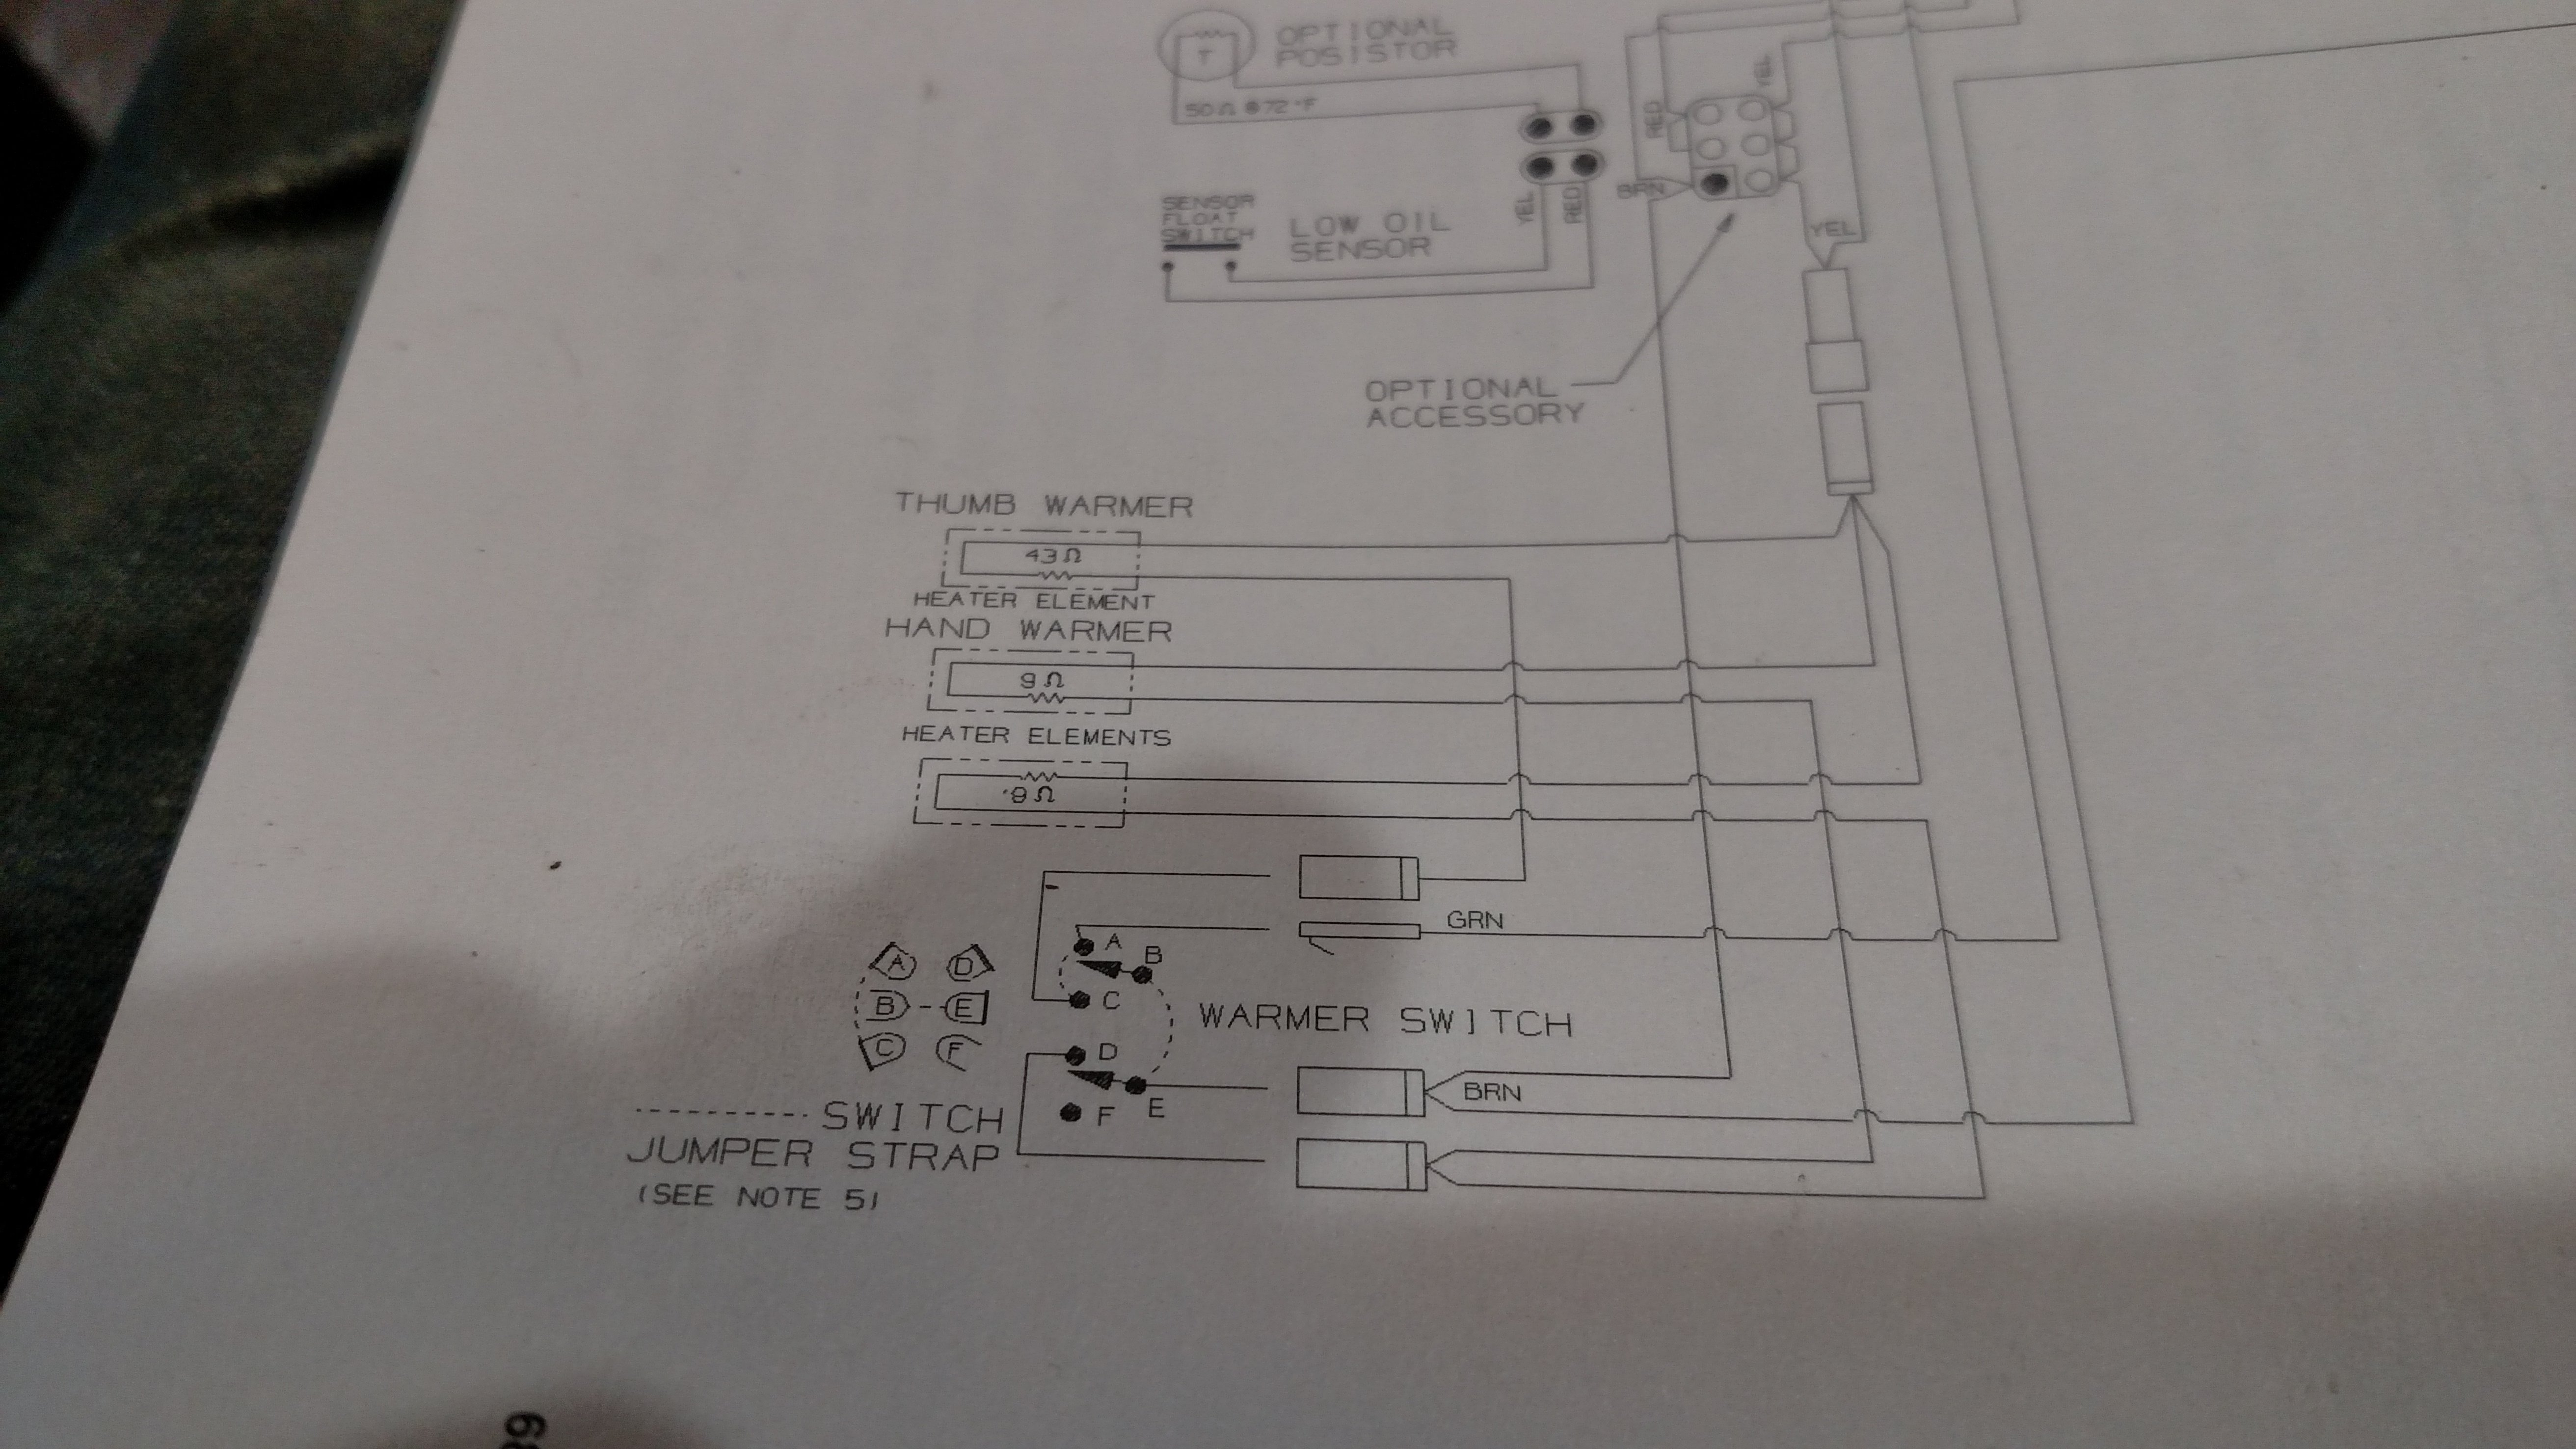 [DIAGRAM_3ER]  1996 ZR 580 Efi [detailed] console wiring diagram | Arctic Cat Forum | Arctic Cat 580 Wiring Diagram |  | Arctic Cat Forum